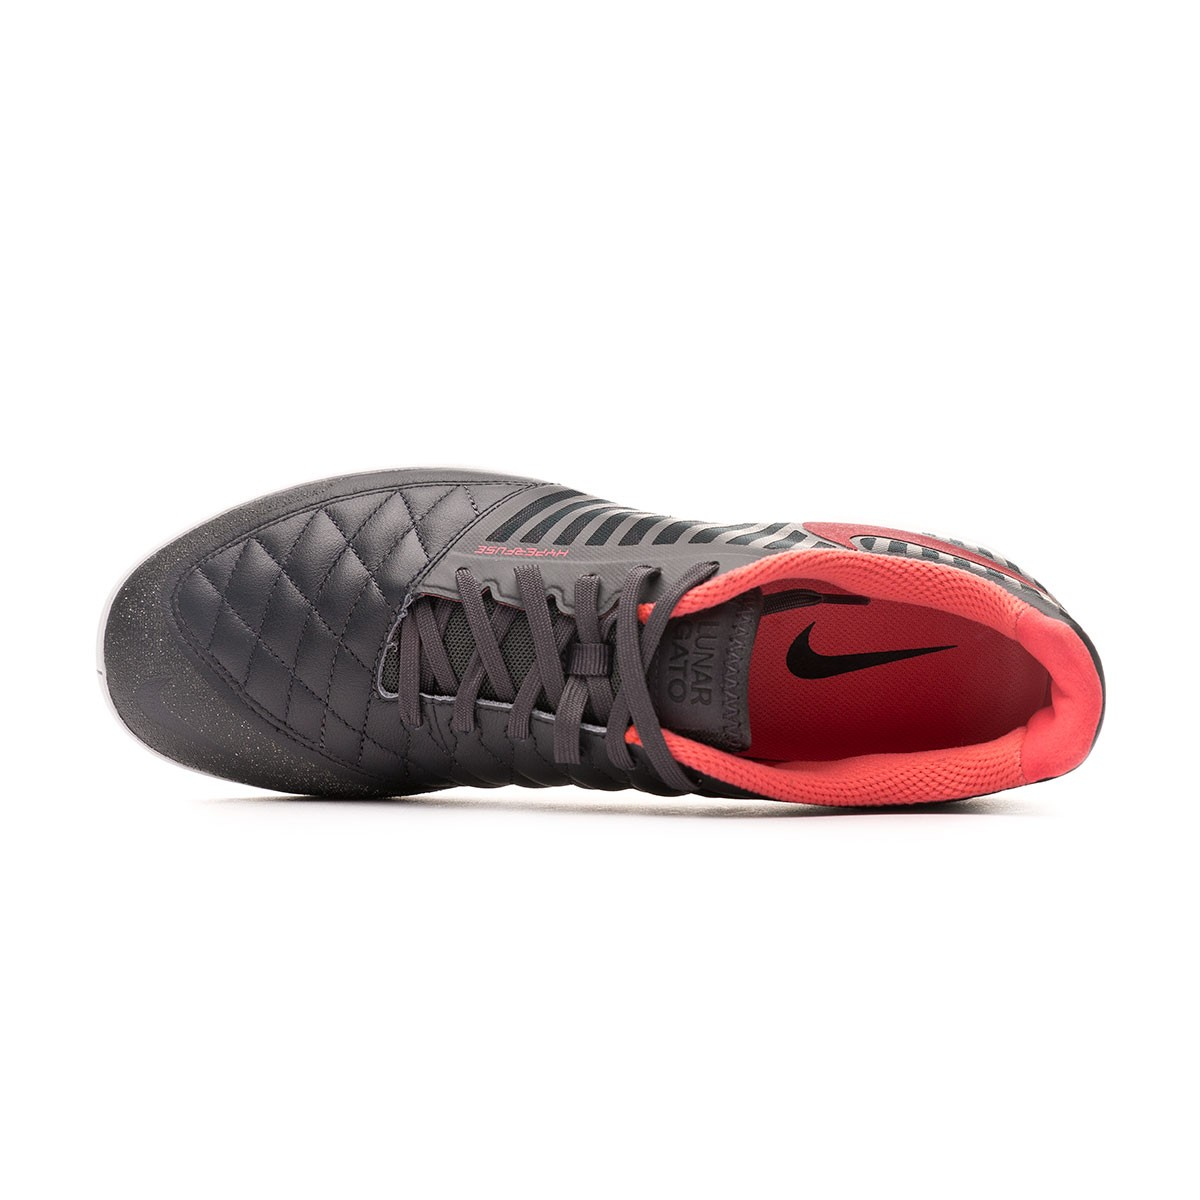 chaussure futsal nike lunar